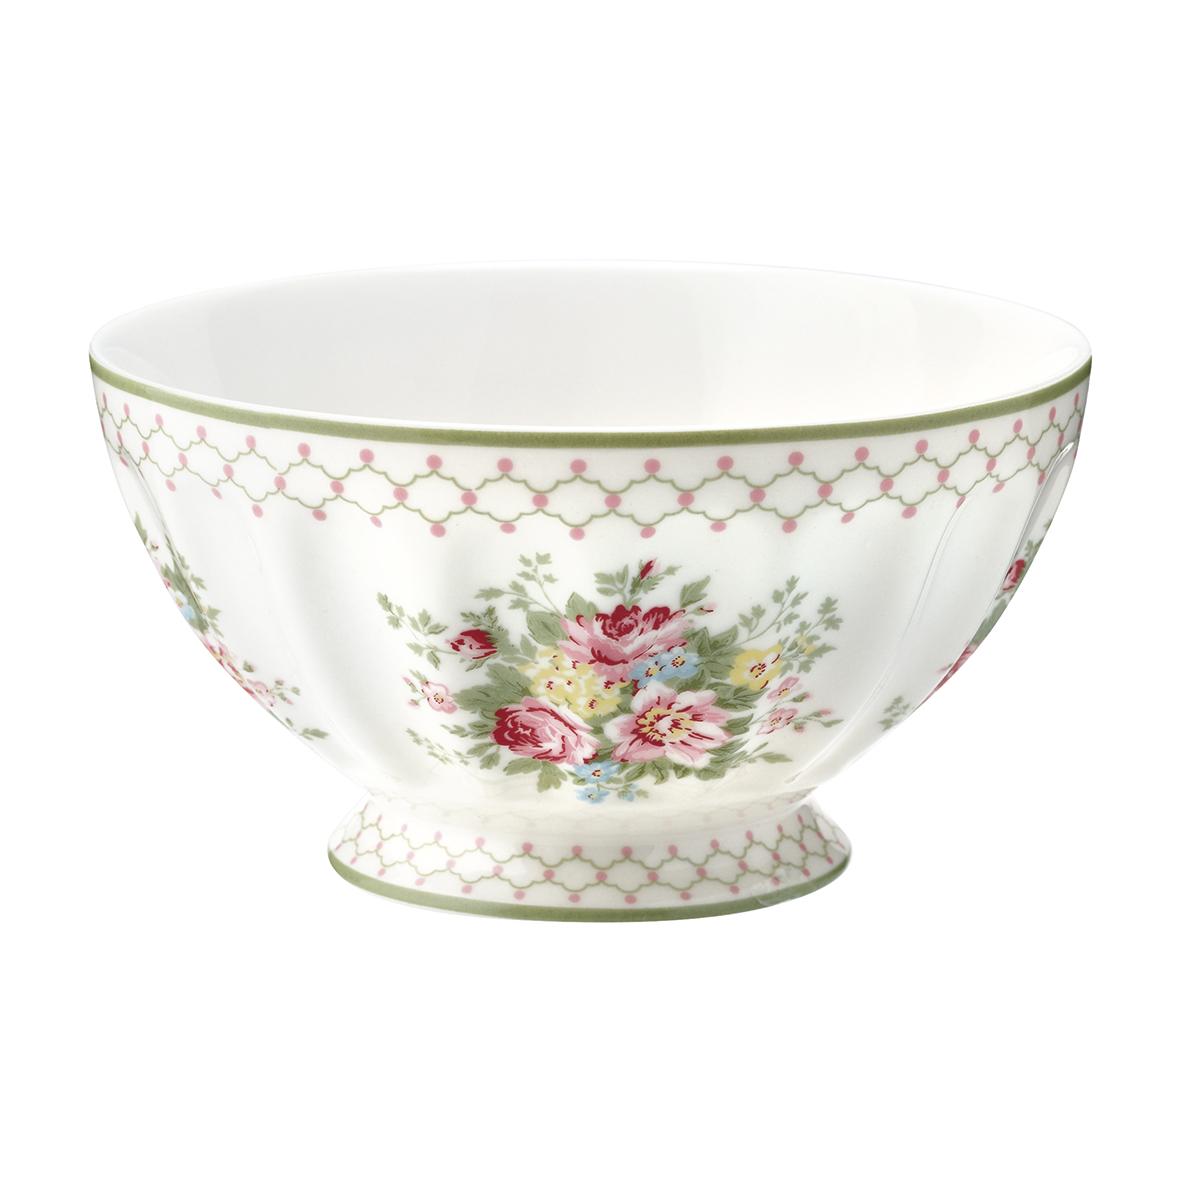 Greengate Schüssel Aurelia white French bowl XL